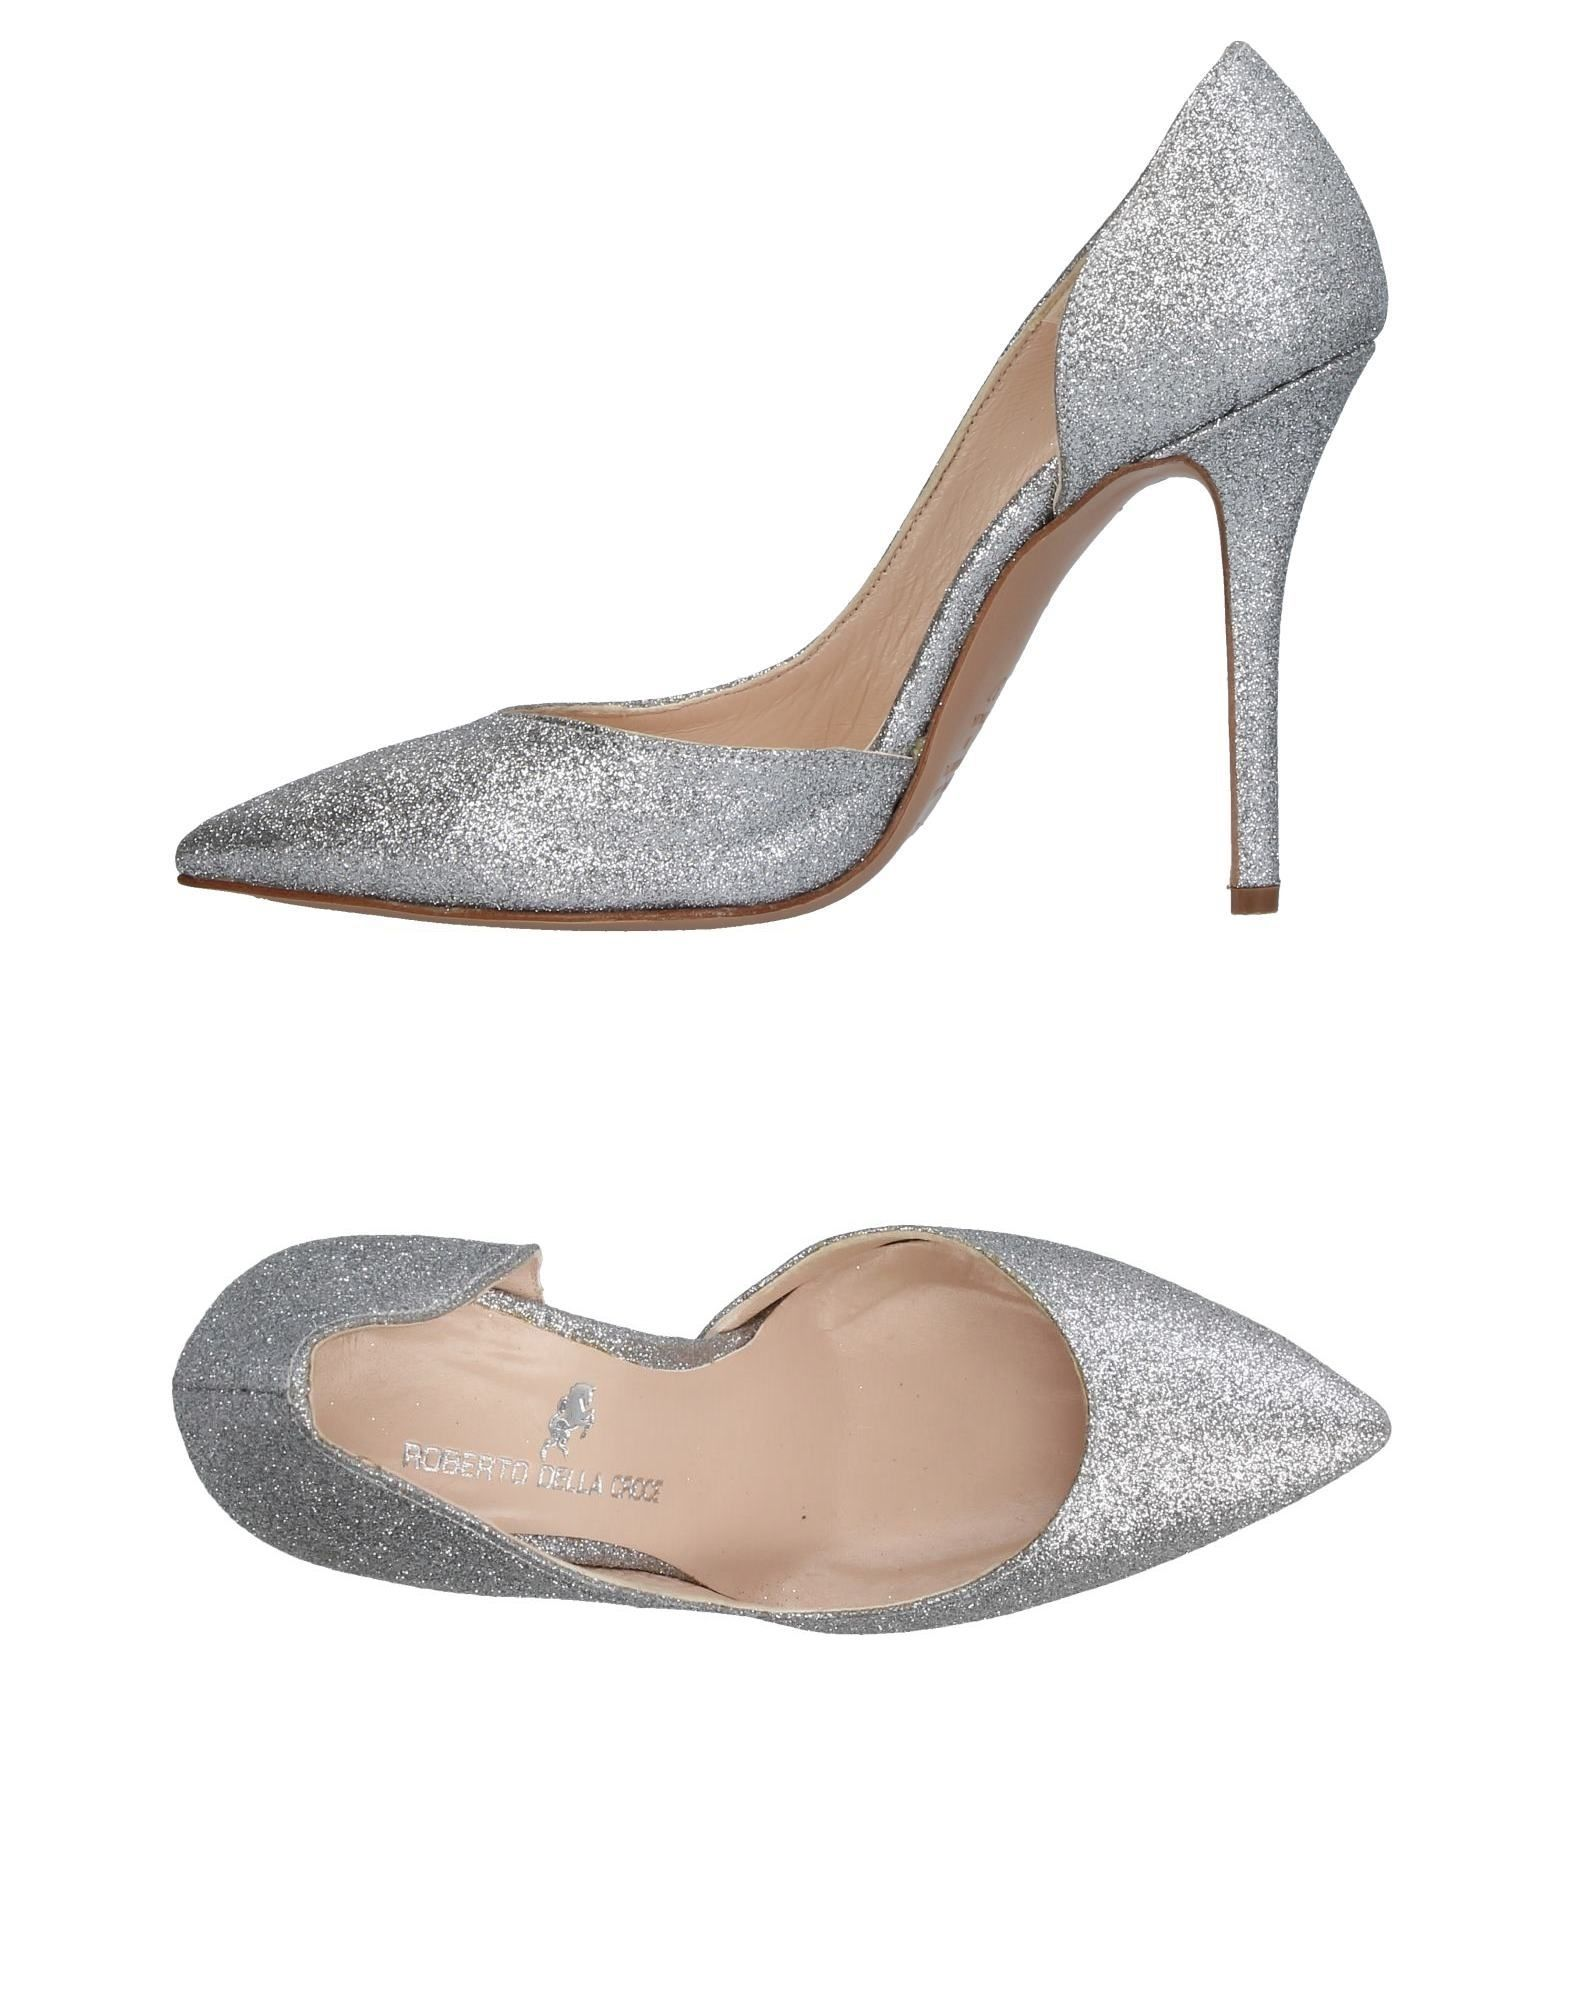 Roberto Della Croce Pumps Damen   Damen 11411586HF Gute Qualität beliebte Schuhe 8ec305